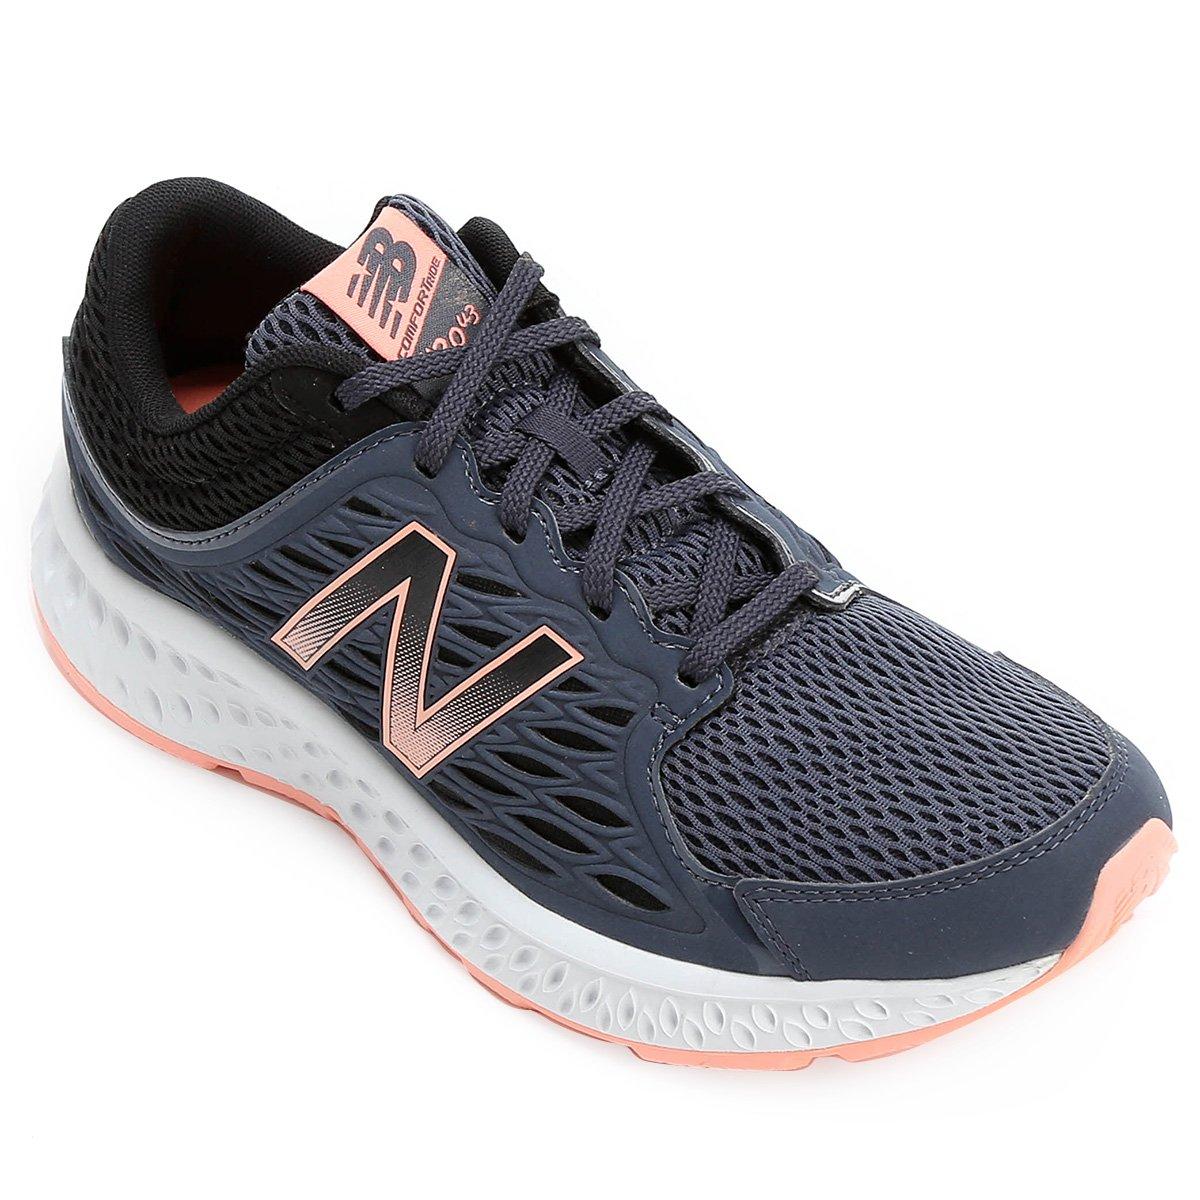 4f92ce5783 Tênis New Balance 420 V3 Feminino